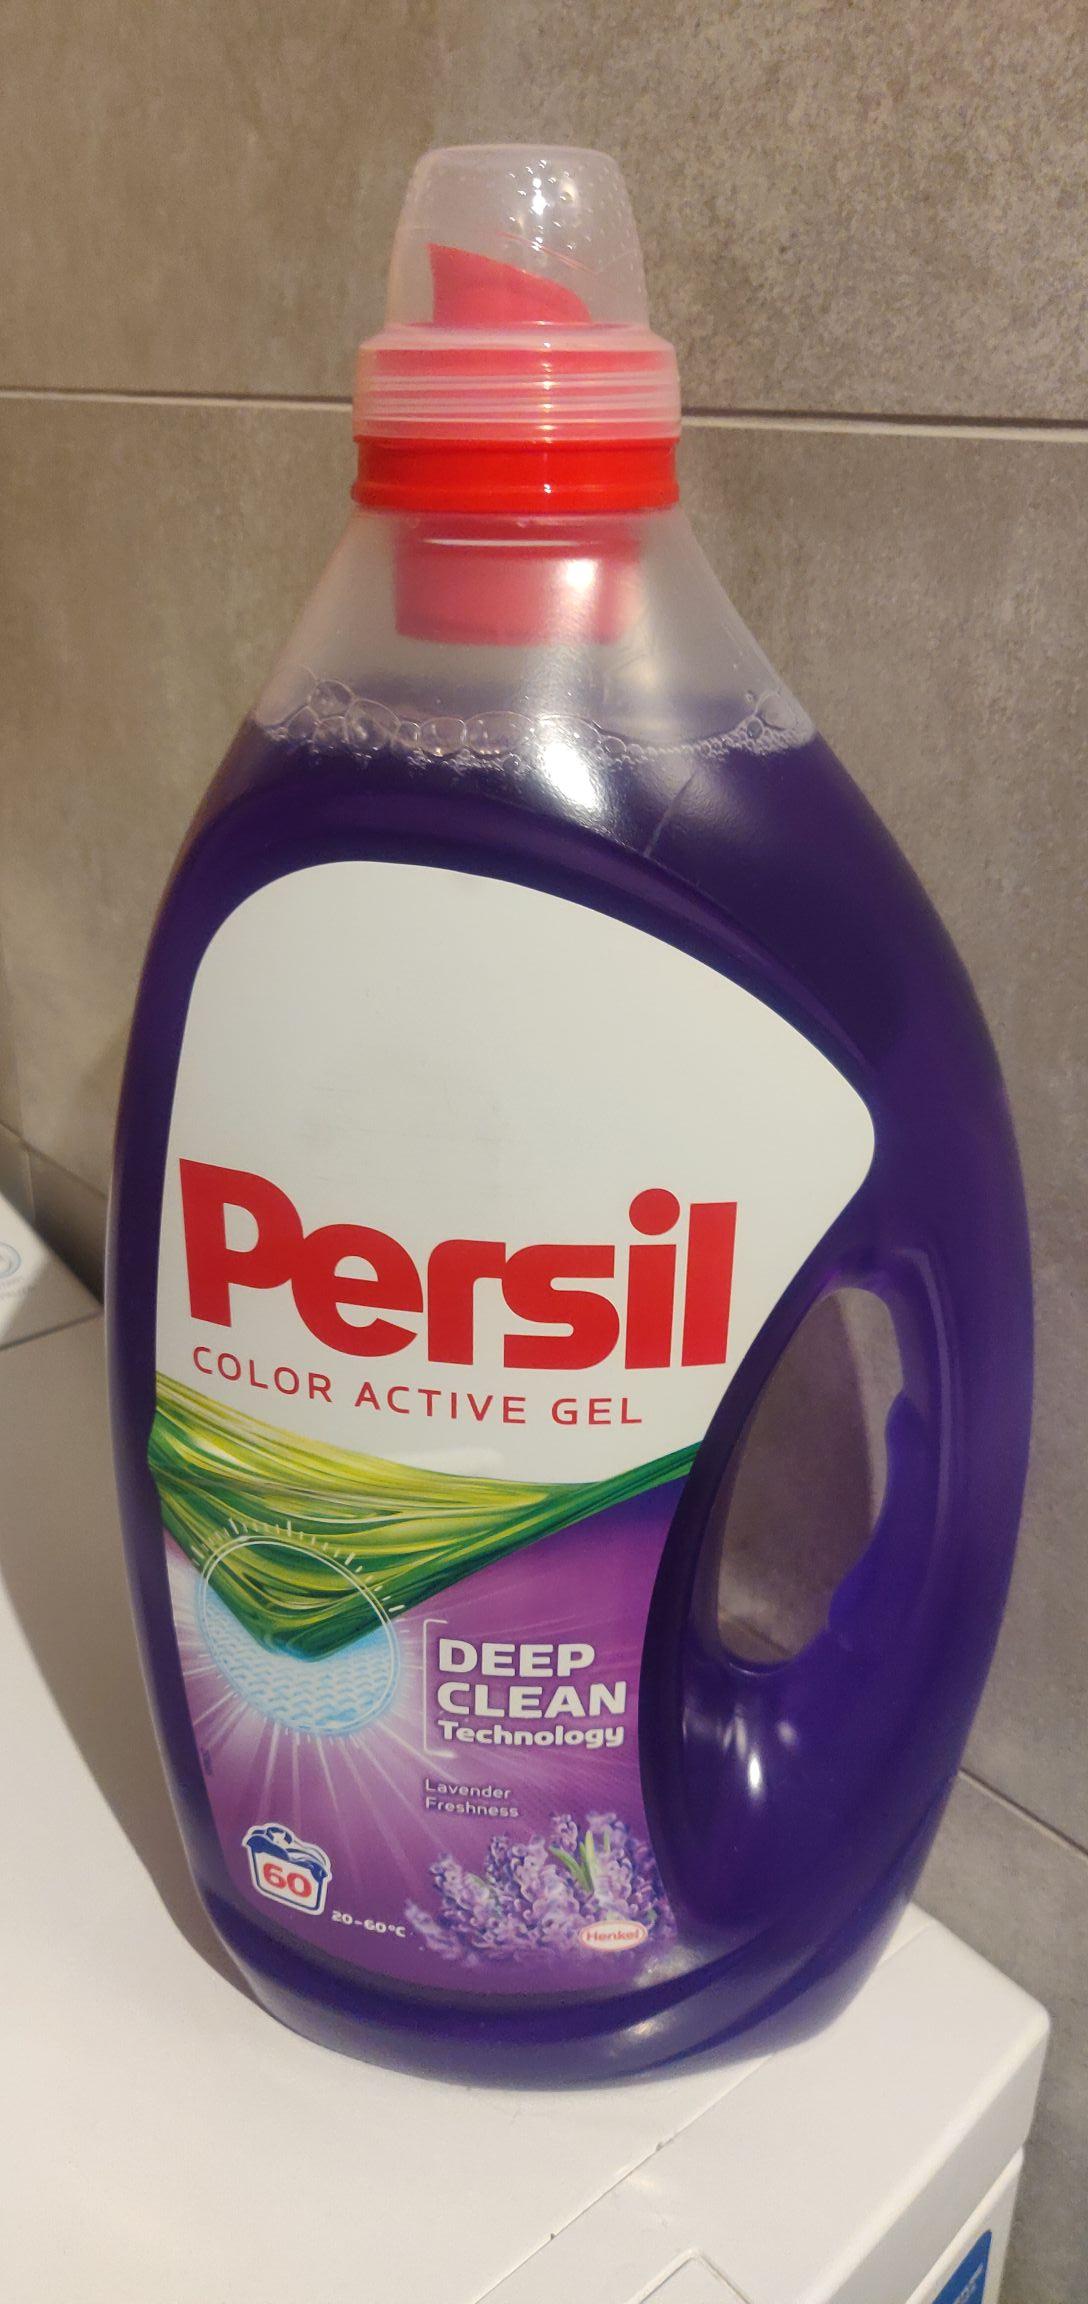 Persil color active gel 3l Selgros